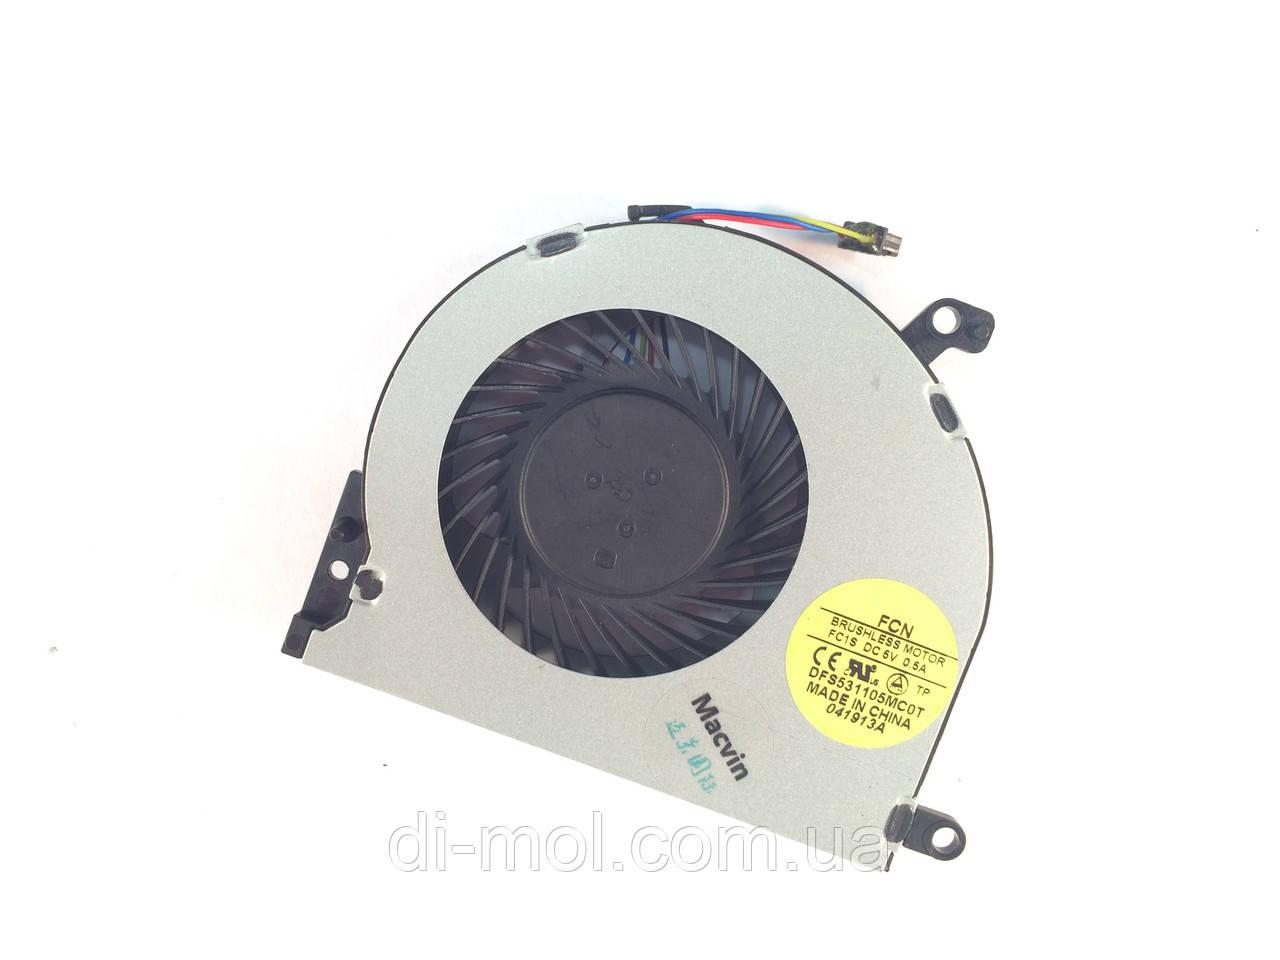 Вентилятор для ноутбука HP Envy m4-1000 series, 4-pin